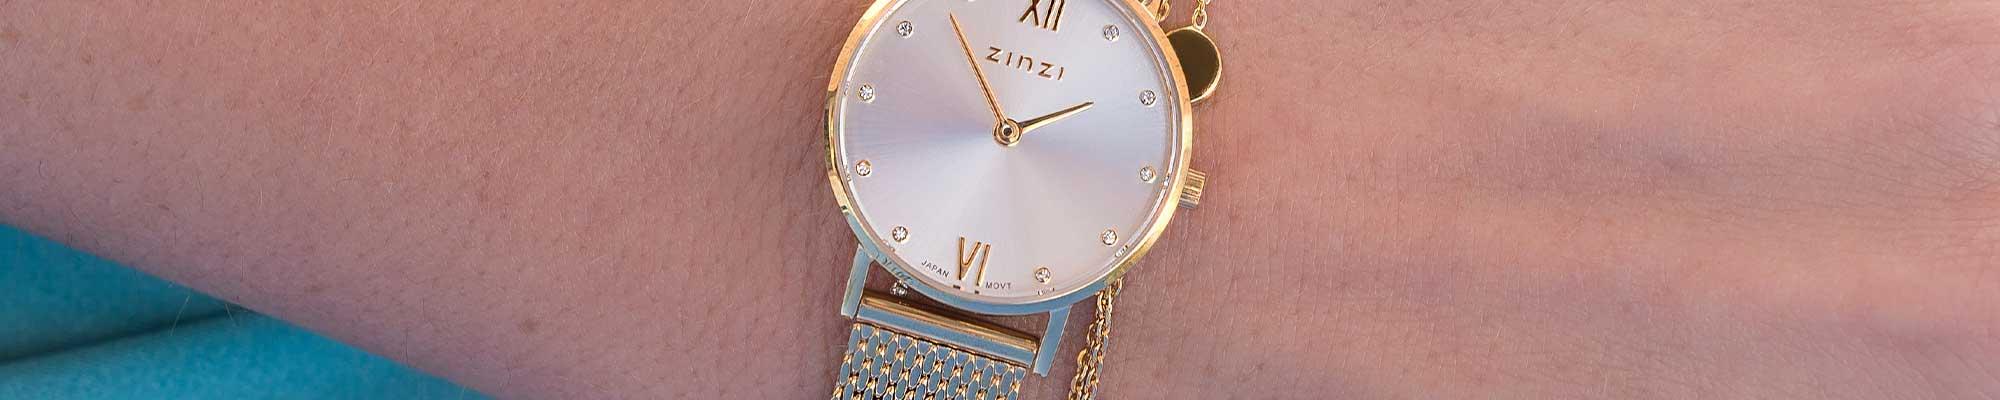 Lady Horloges